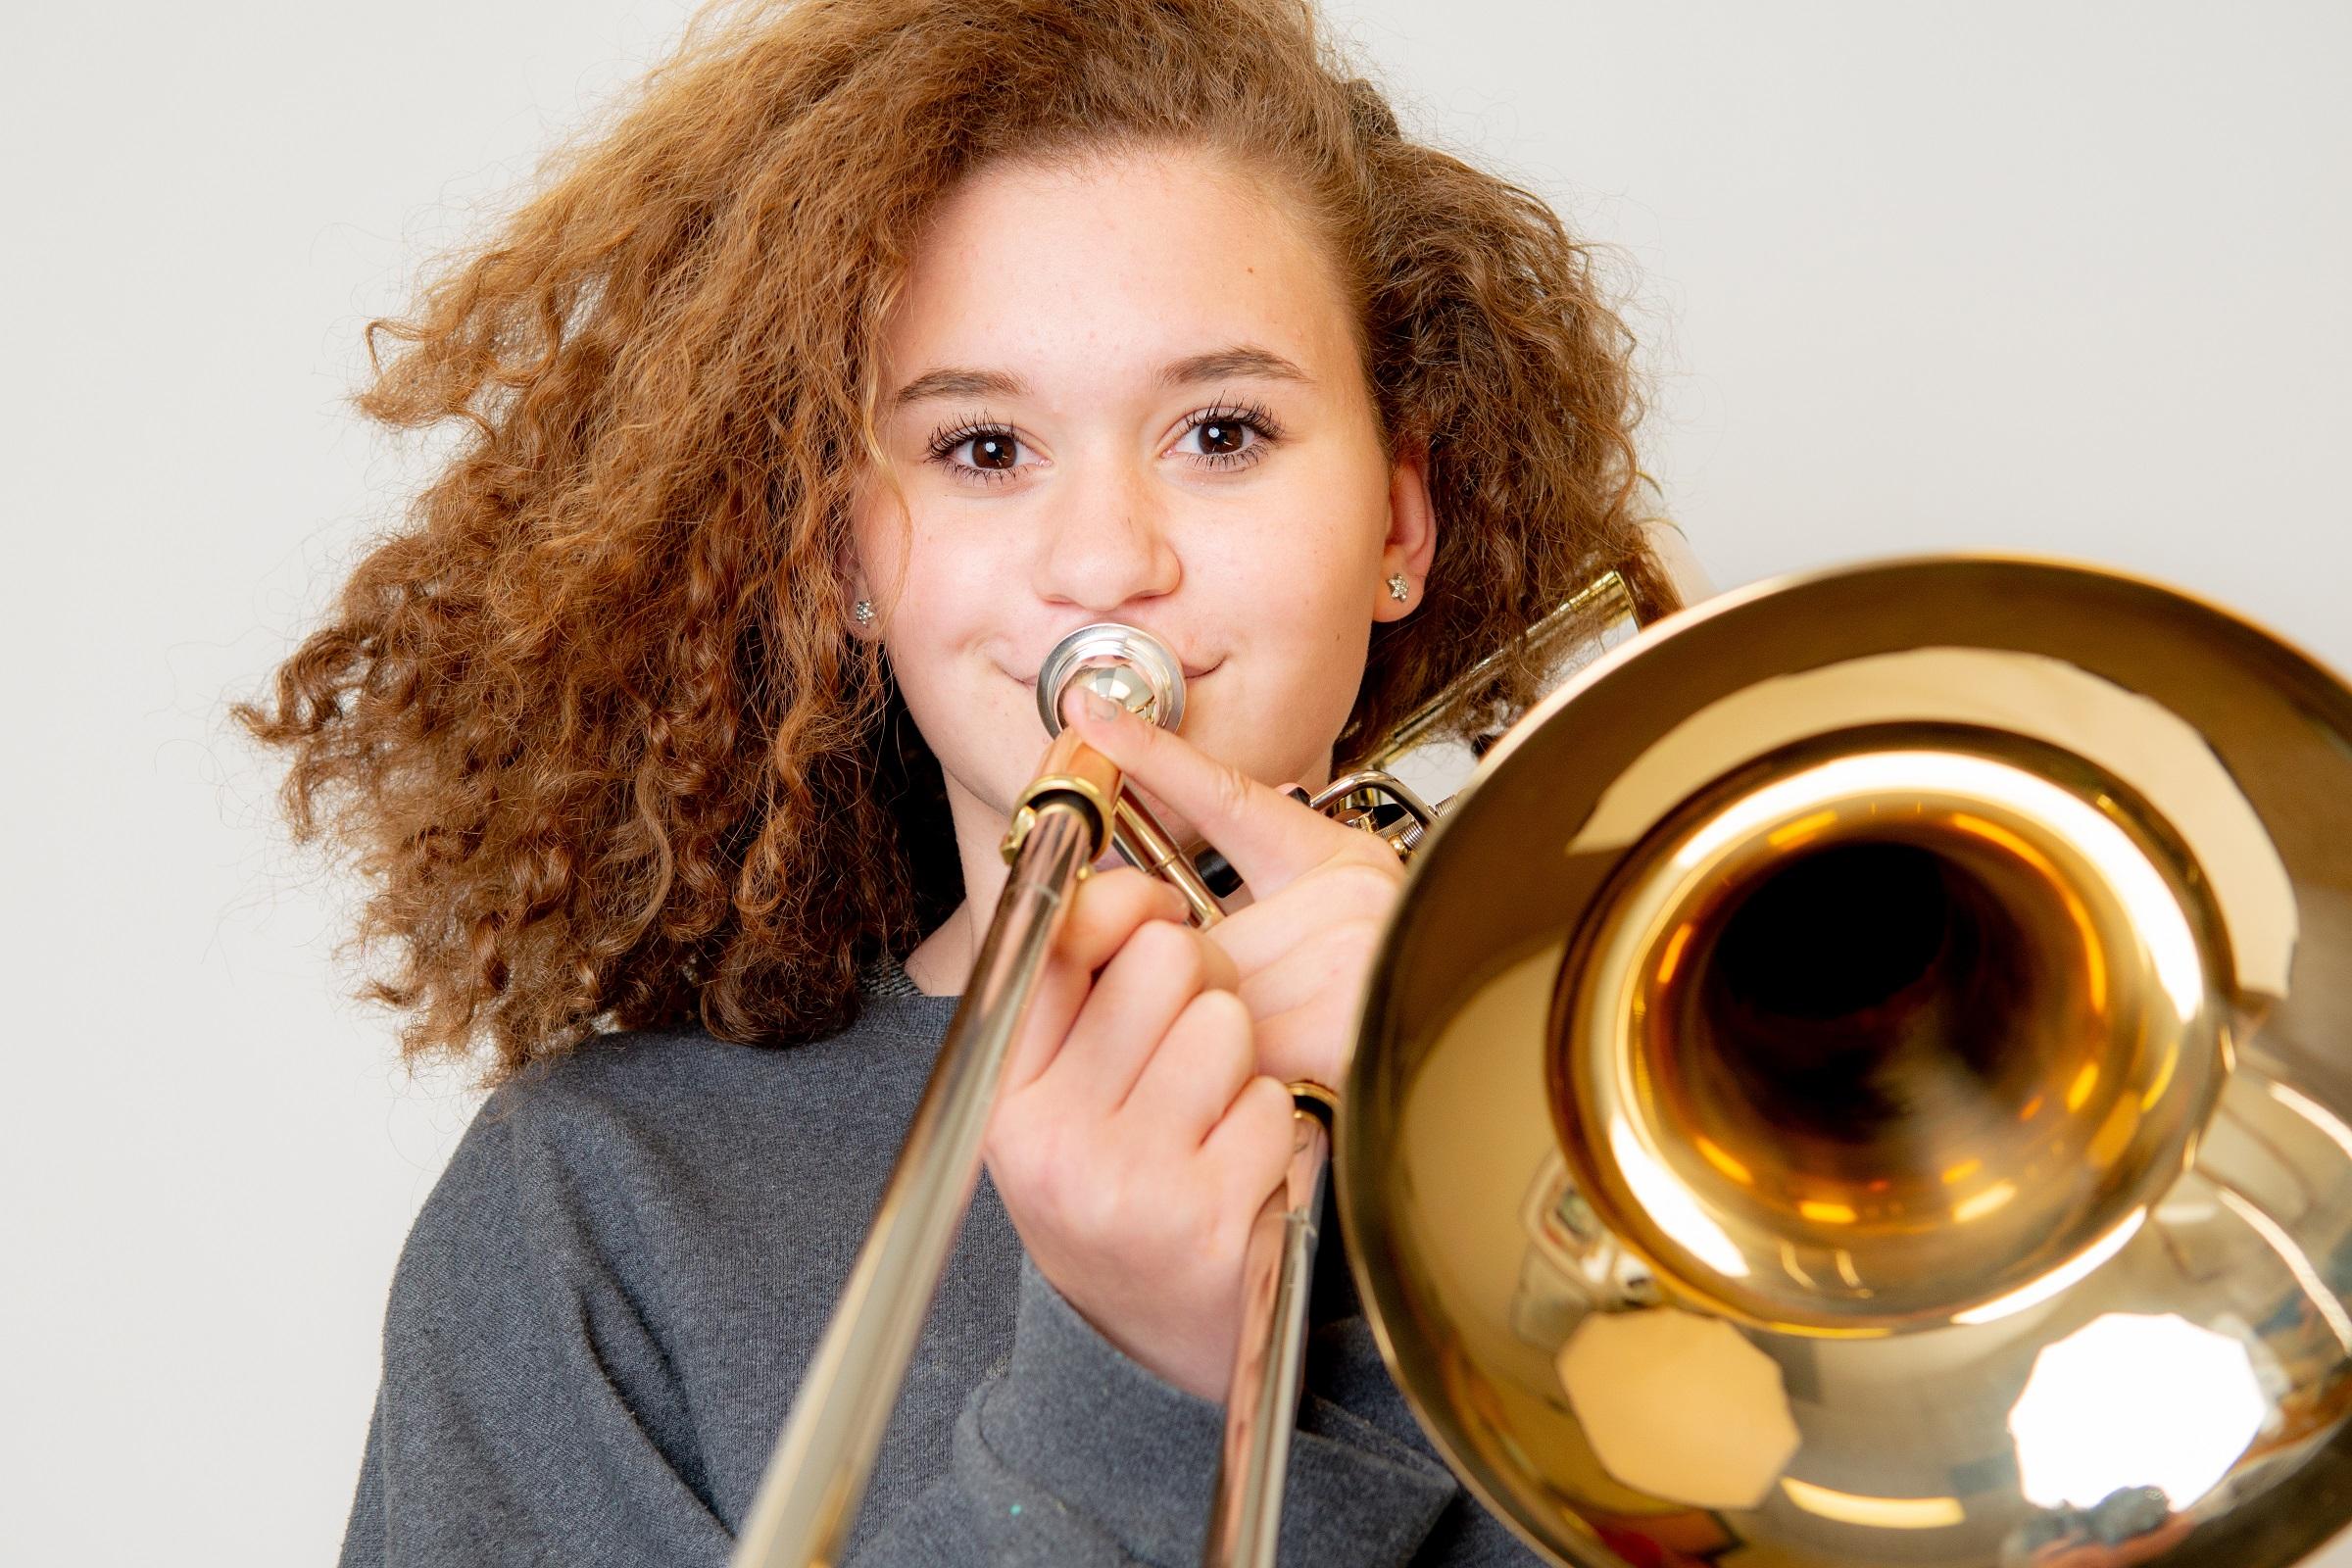 Student Playing Trombone